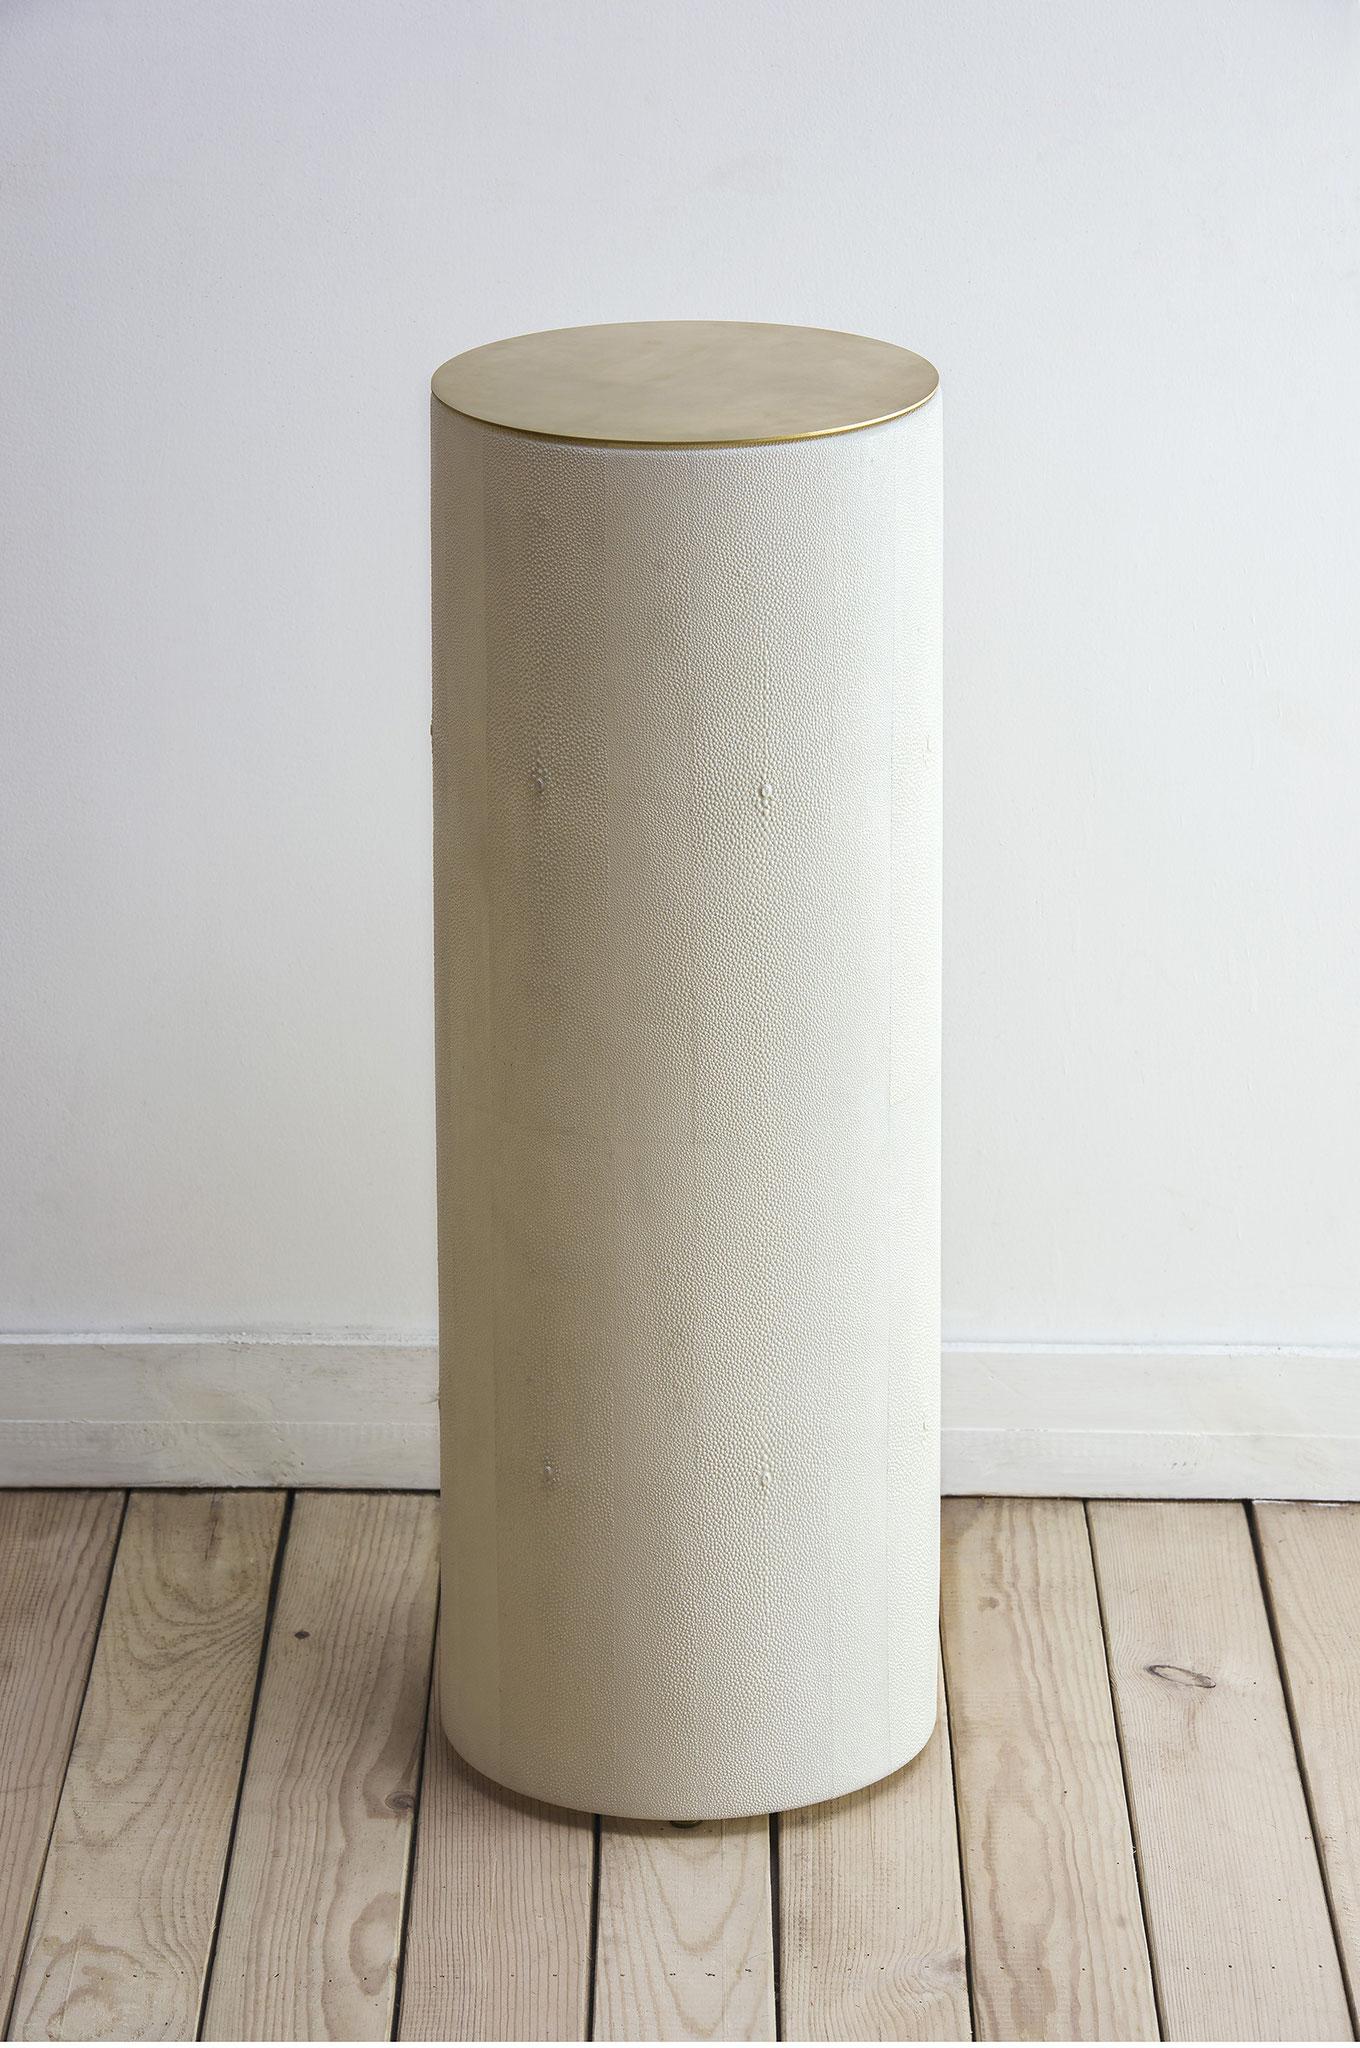 Dimension 70 x 25 cm